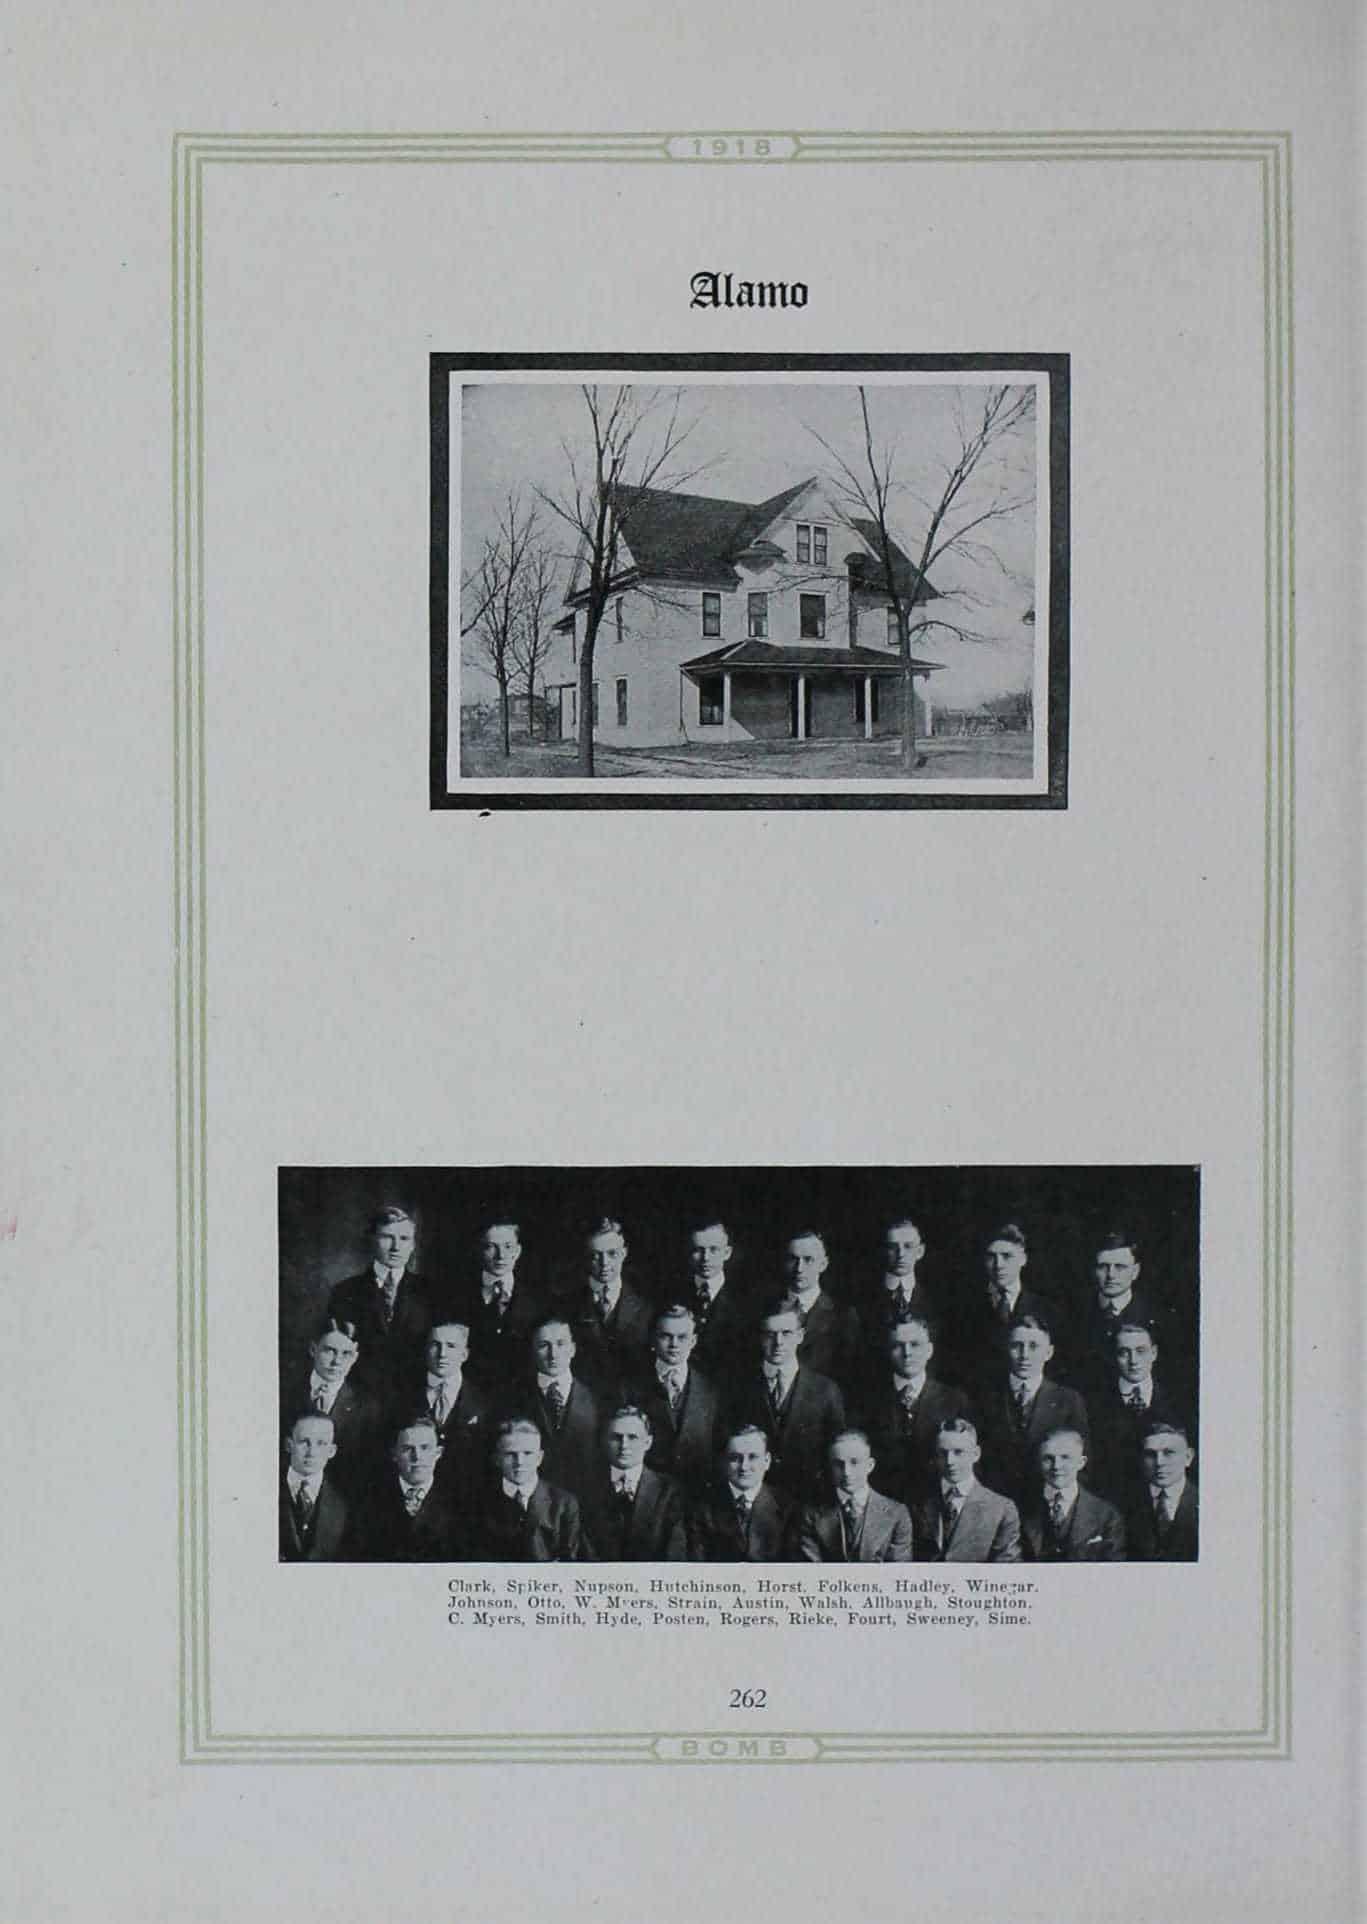 1917 Alamo Club